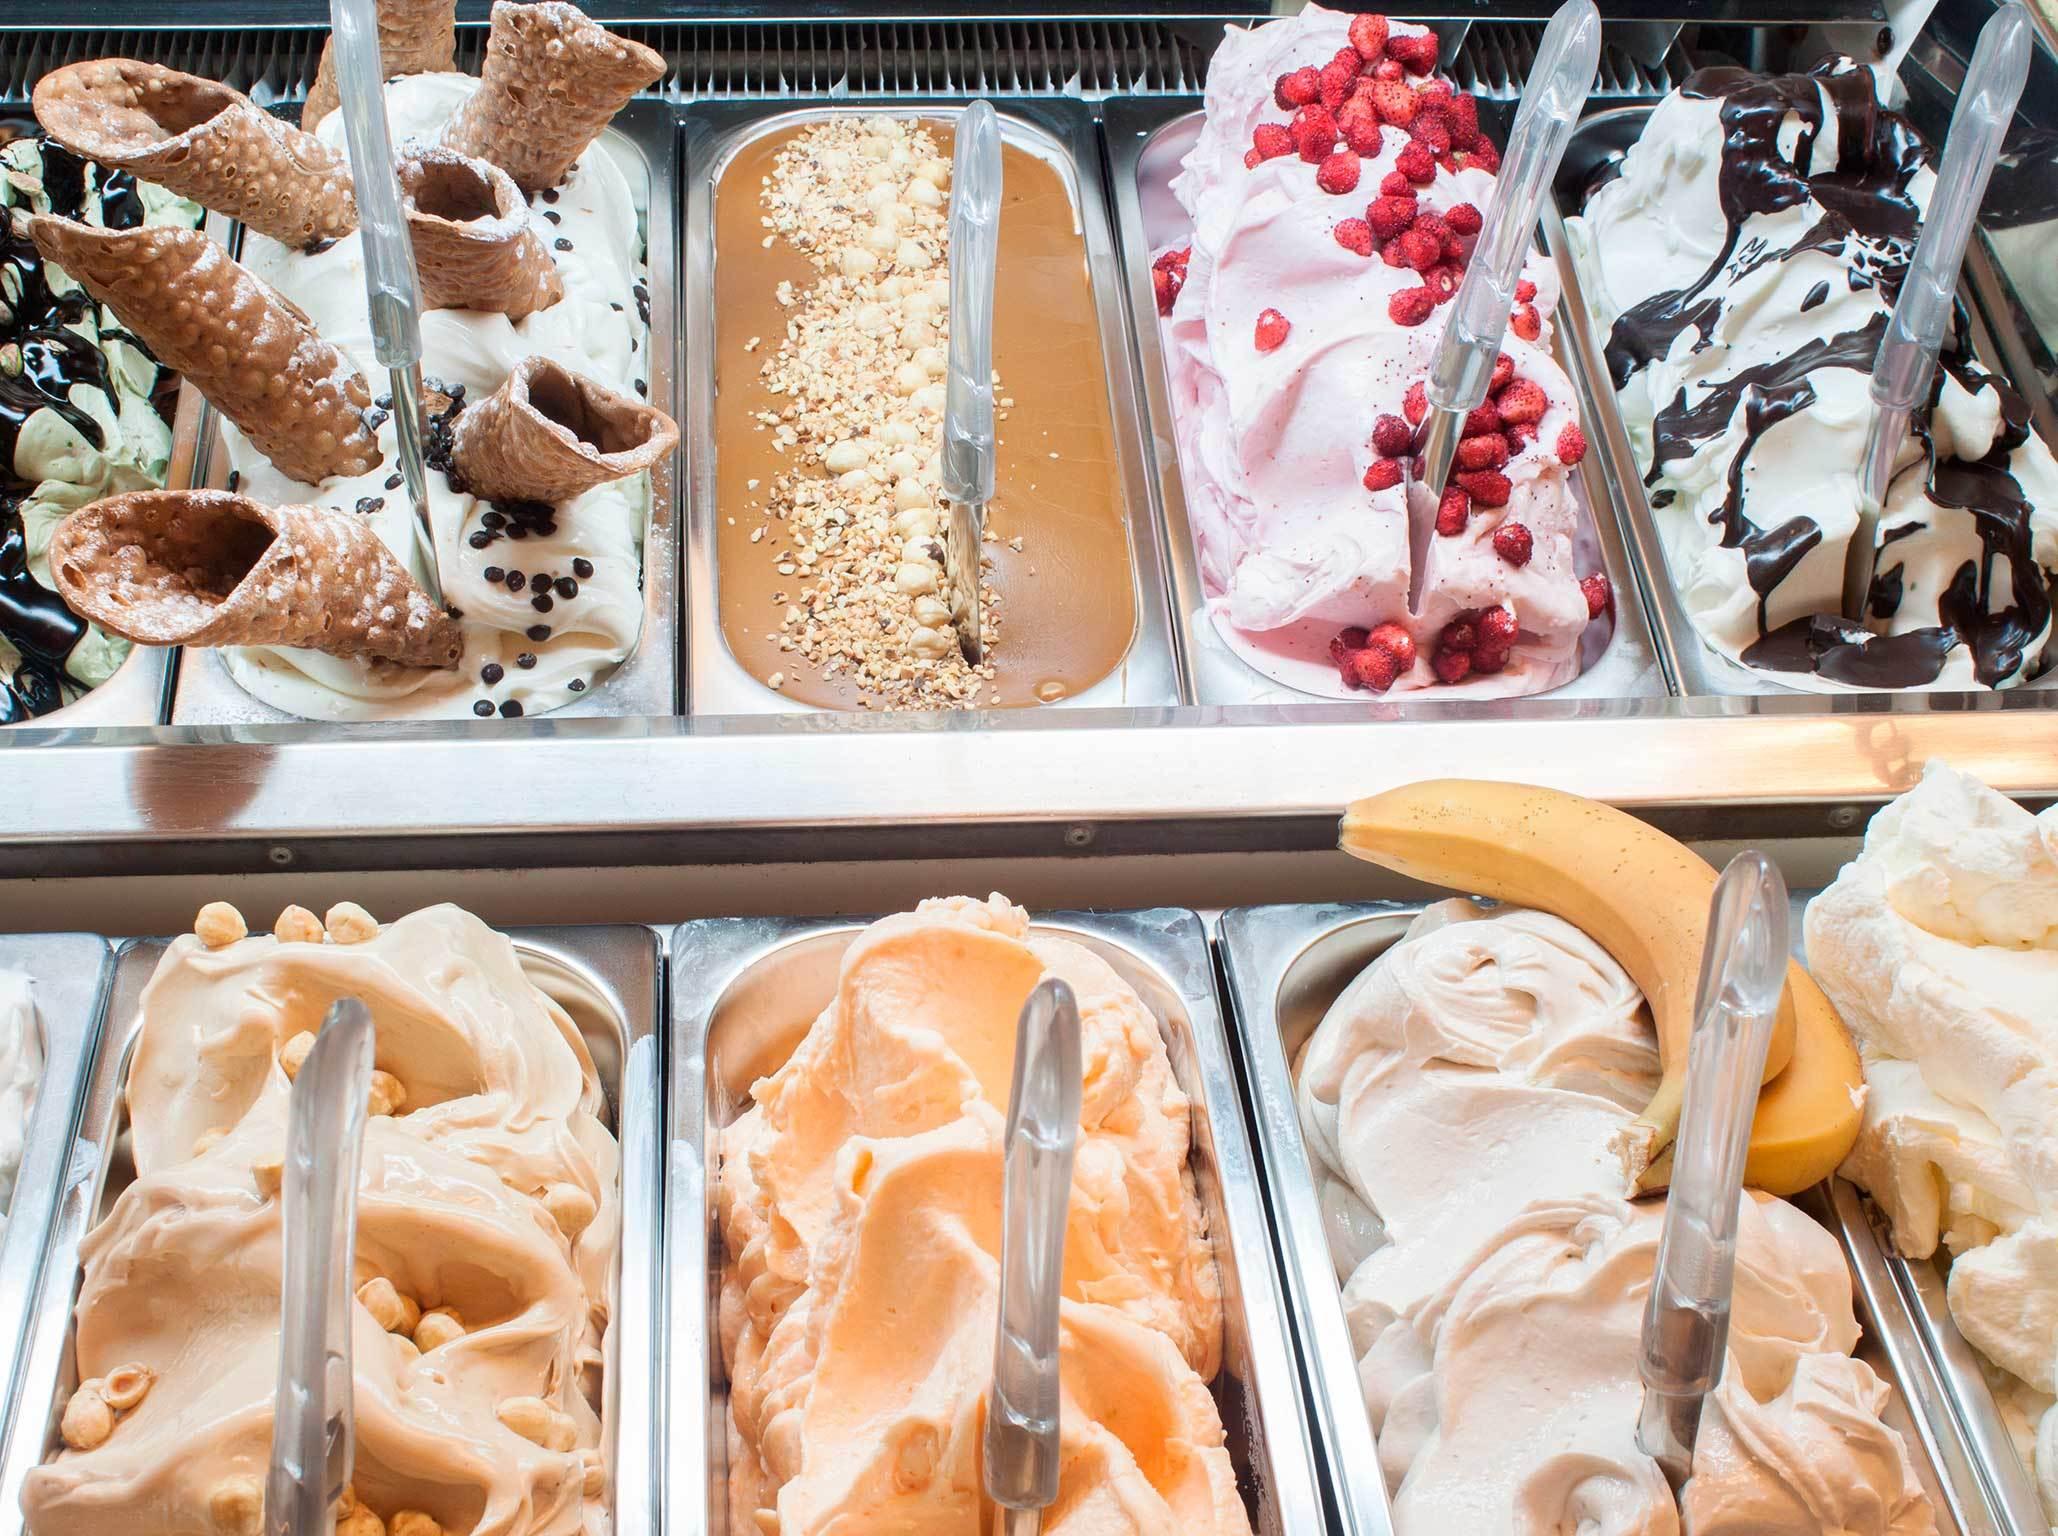 Ice-cream Birmingham - Crocs